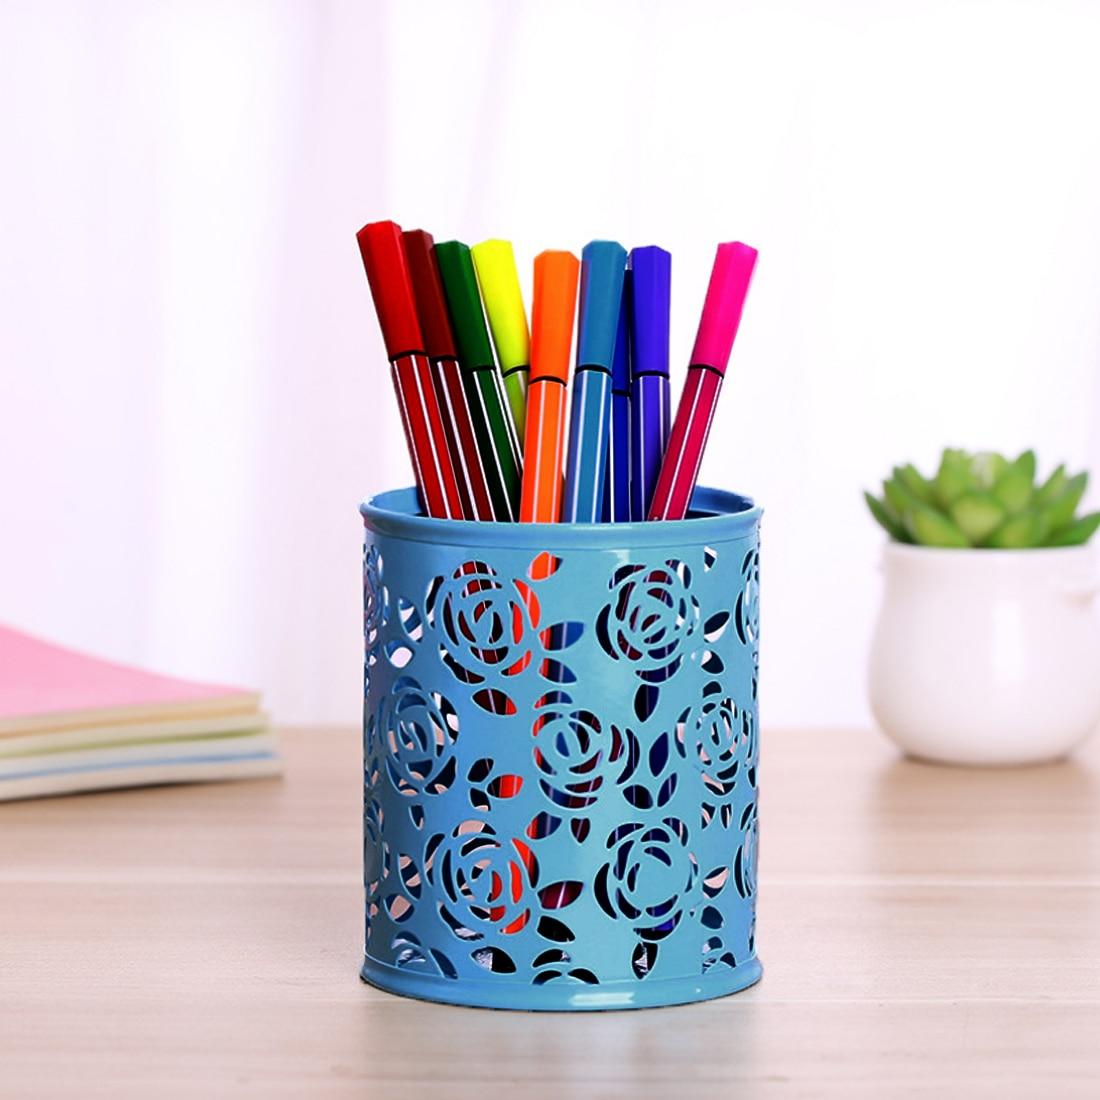 FangNymph Cute Cosmetics Organizer Box Hollow Rose Flower Storage Box Metal Pen Pencil Cup Card Holder Desk Home Organizer